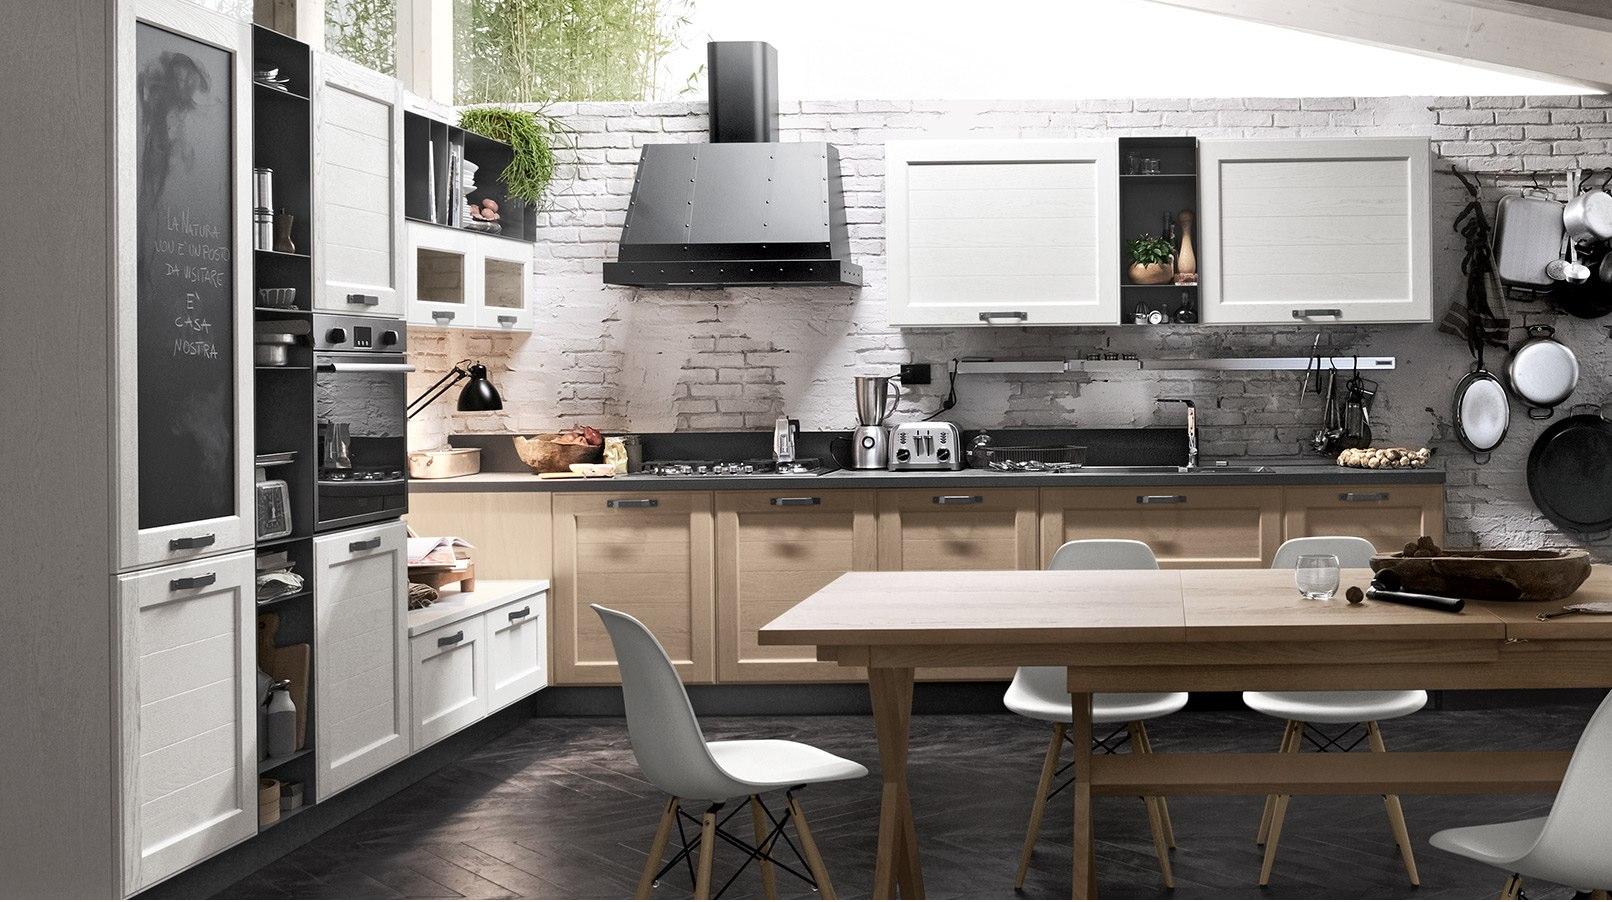 stosa-cucine-contemyork-221